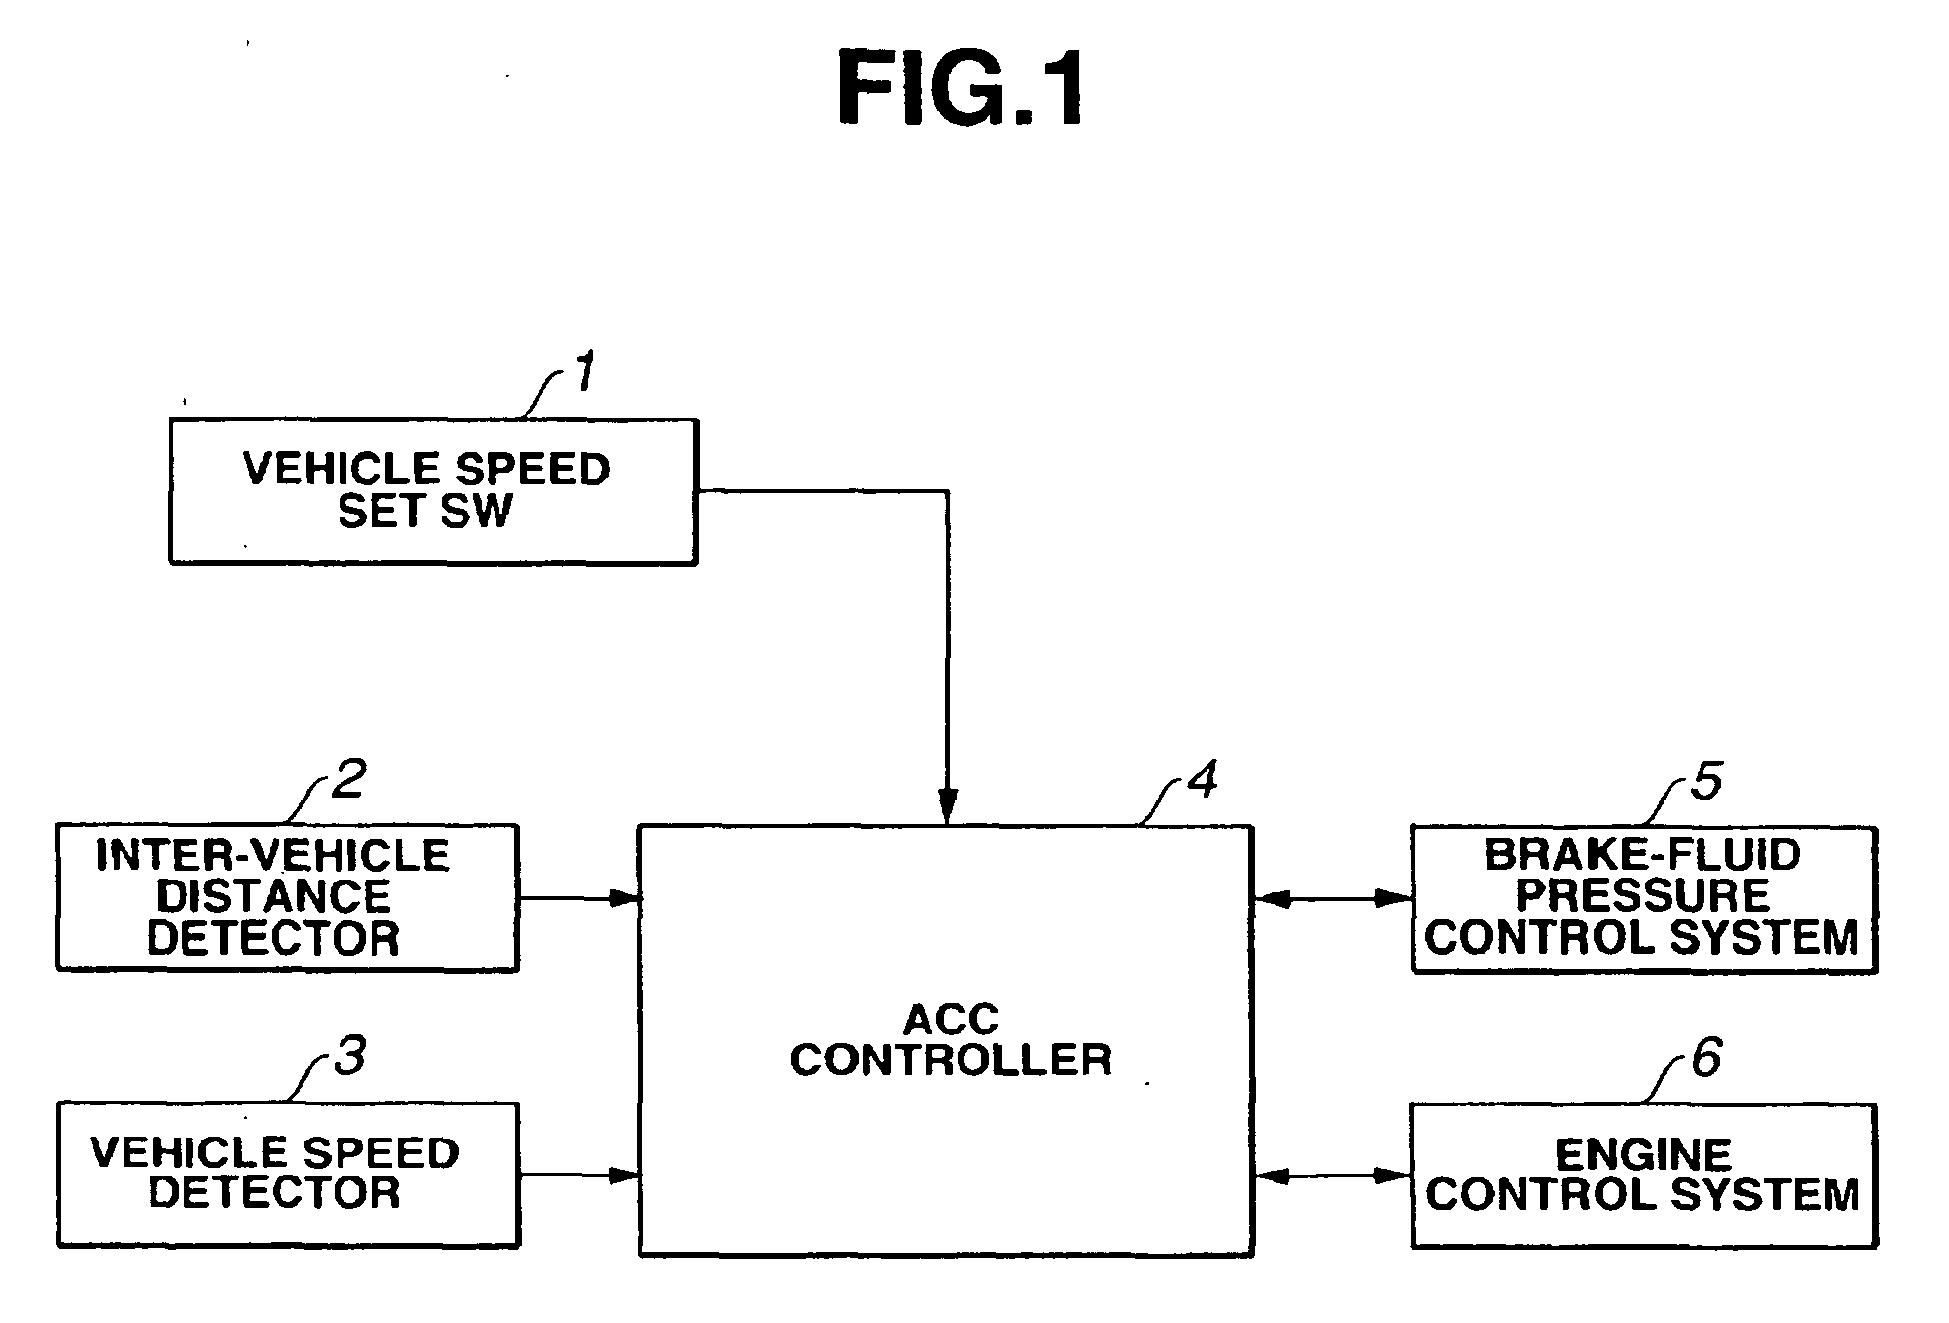 kia cruise control diagram example electrical wiring diagram u2022 rh huntervalleyhotels co Cruise Control Vacuum Diagram Cruise Control Vacuum Diagram